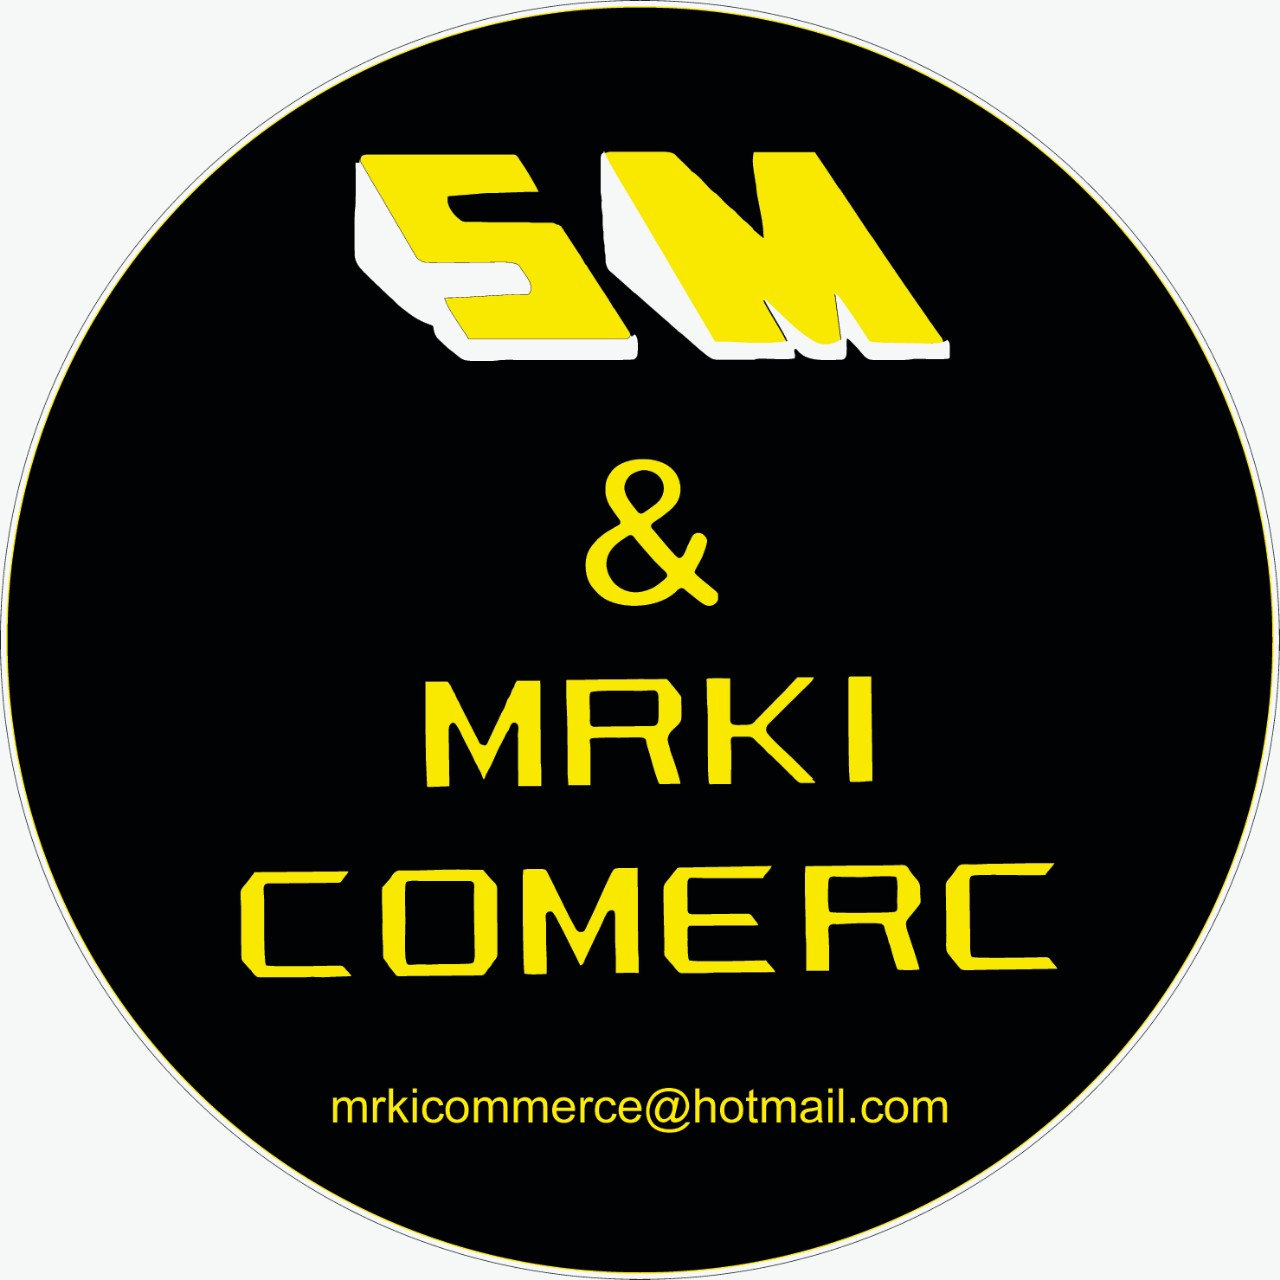 S&M Mrki komerc